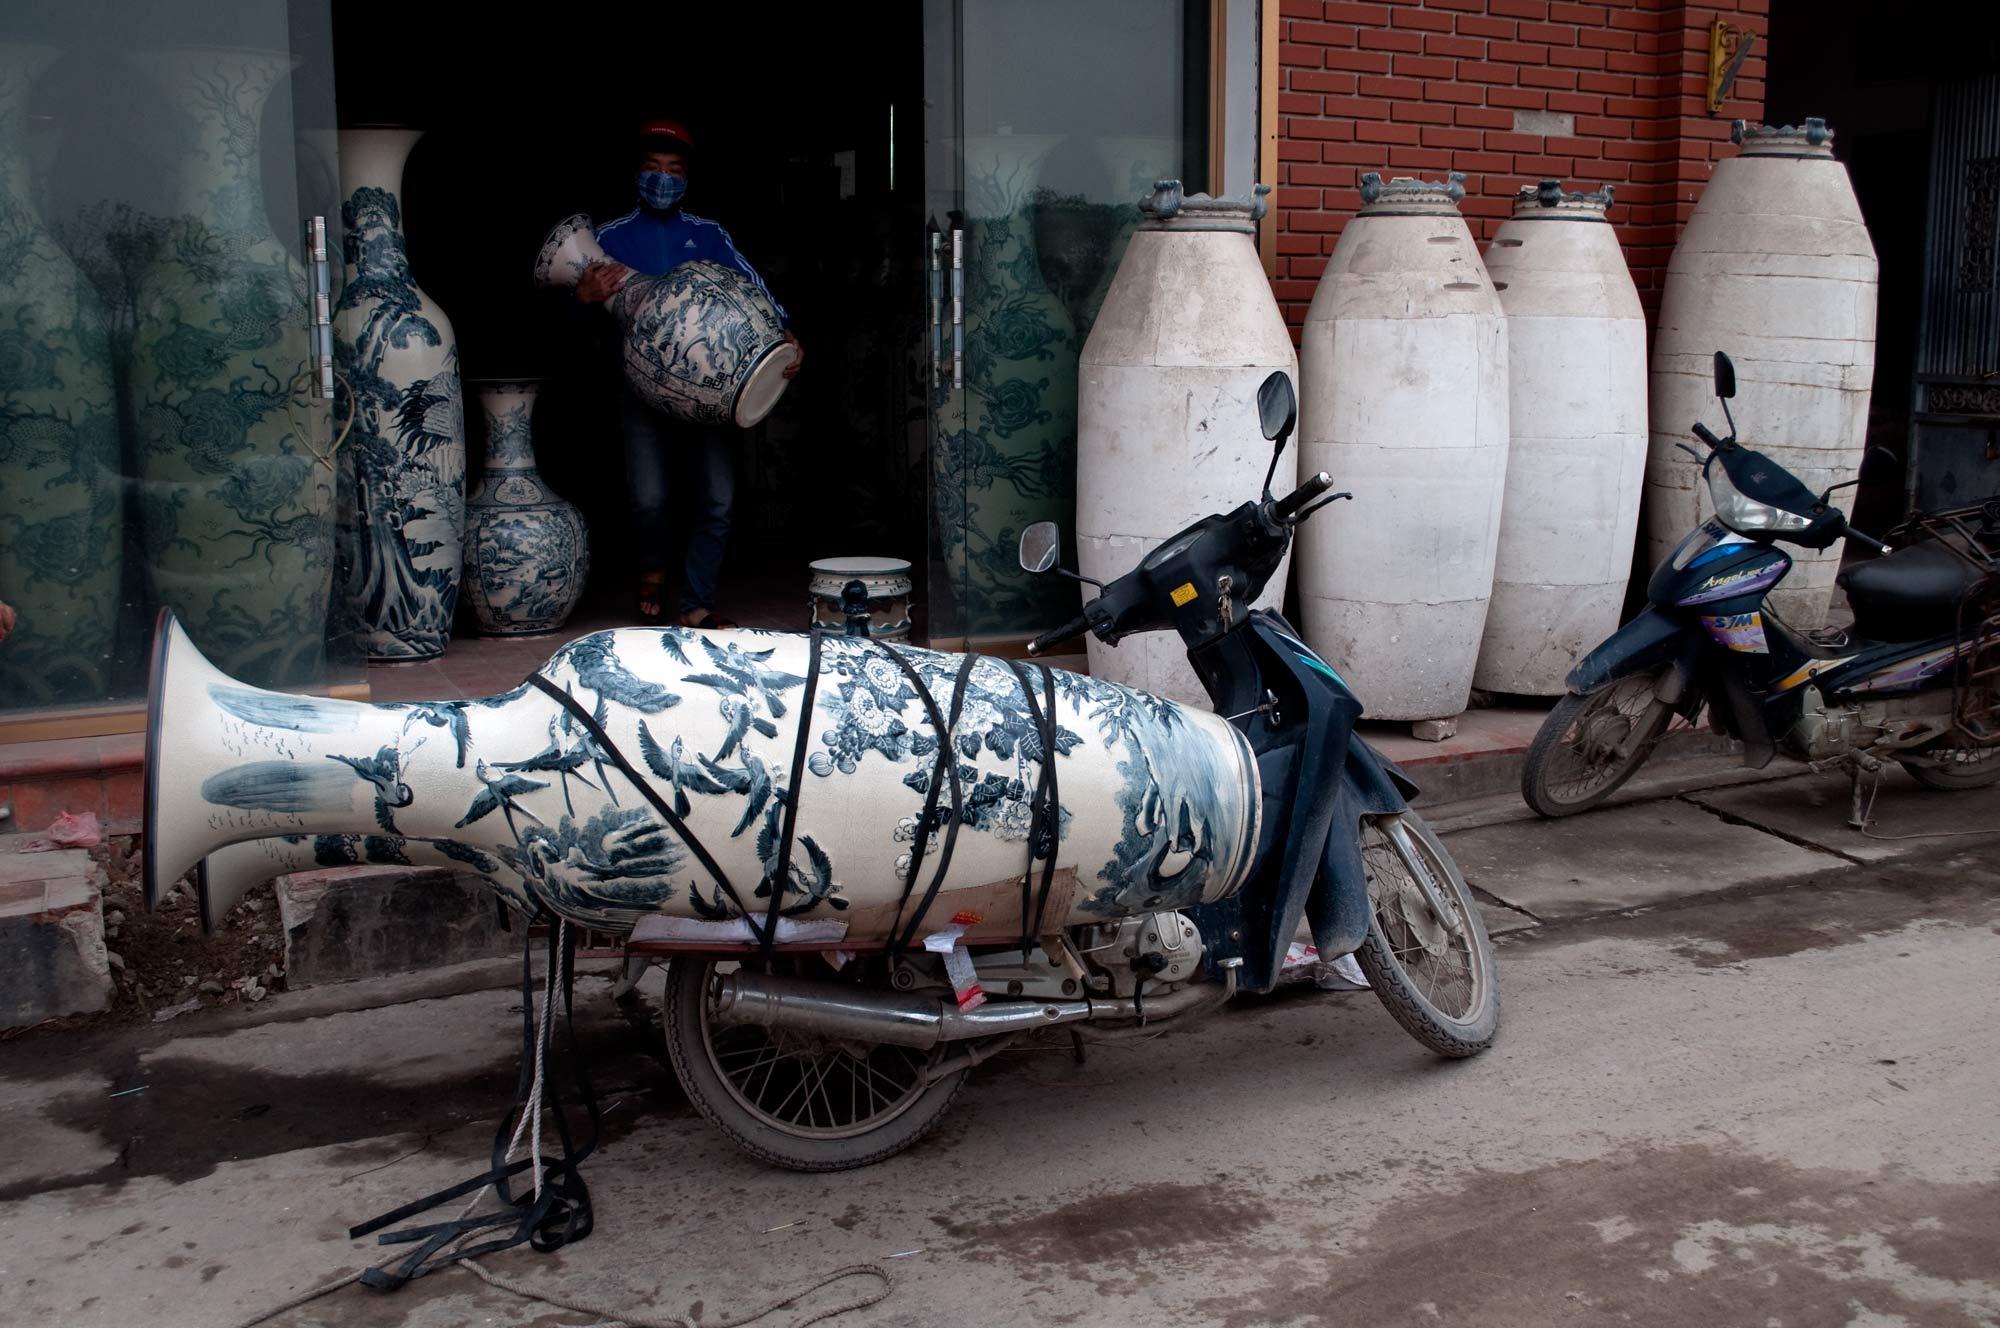 travel-vn-jar-onscooter.jpg